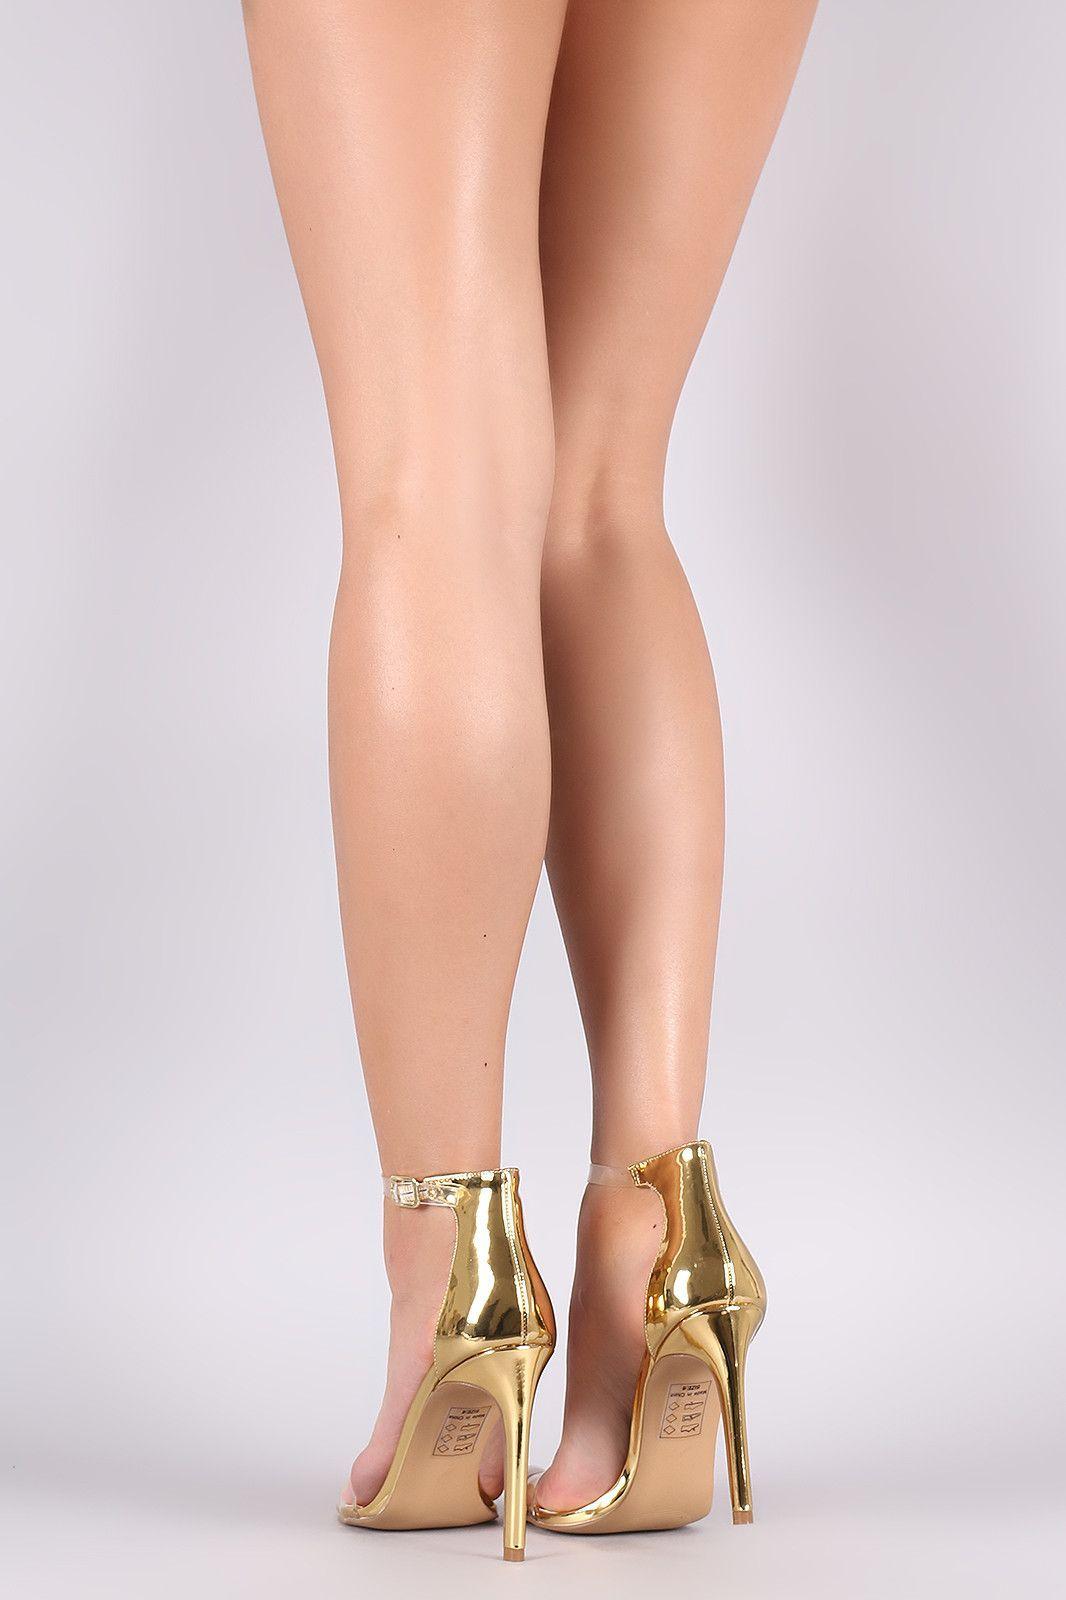 Shoe republic la metallic transparent ankle strap stiletto heel